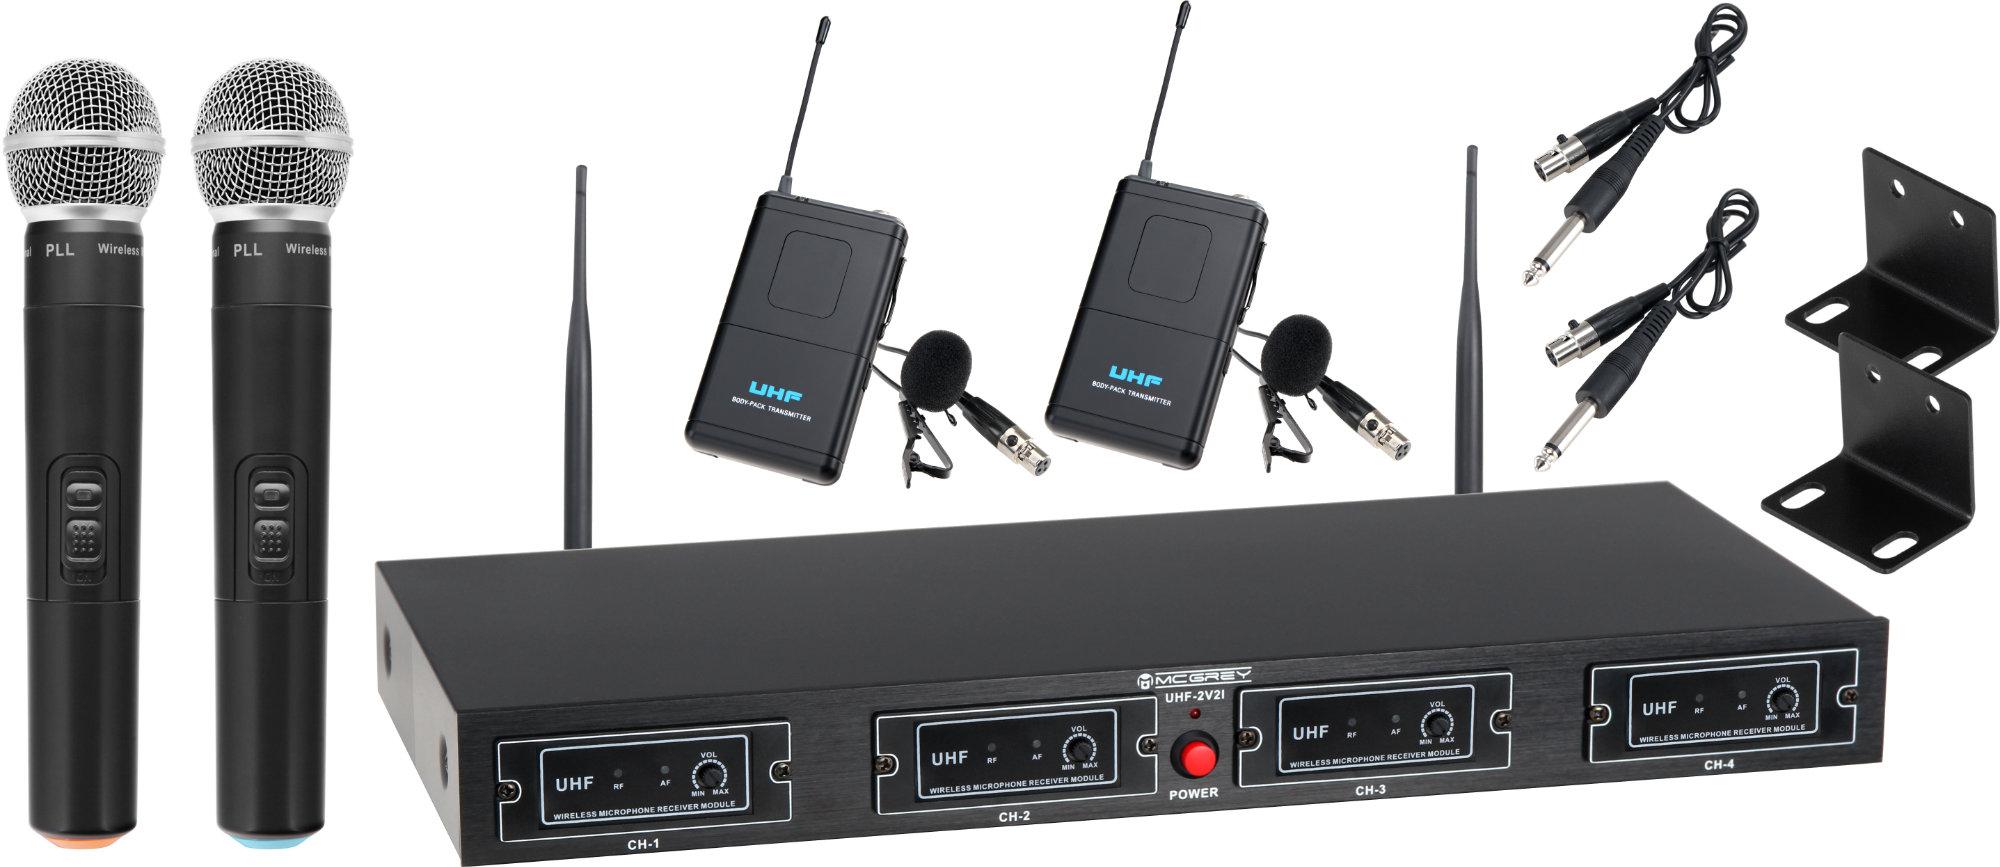 McGrey UHF 2V2I Quad Funkmikrofonset mit 2x Handmikrofon und 2x Lavaliermikrofon 50m